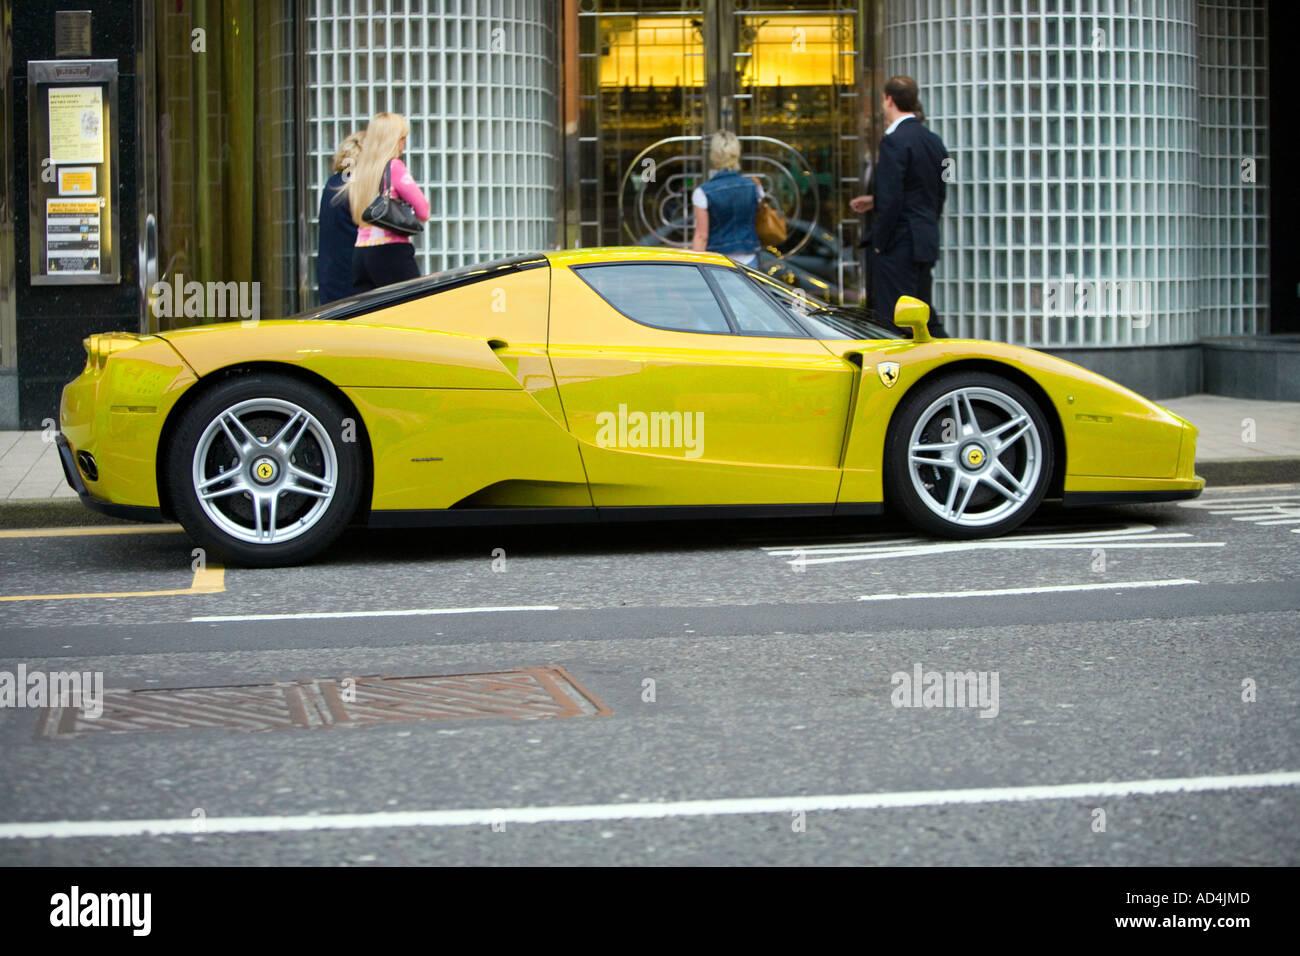 Yellow Ferrari Enzo Parked Outside Restaurant In Leeds Stock Photo Alamy